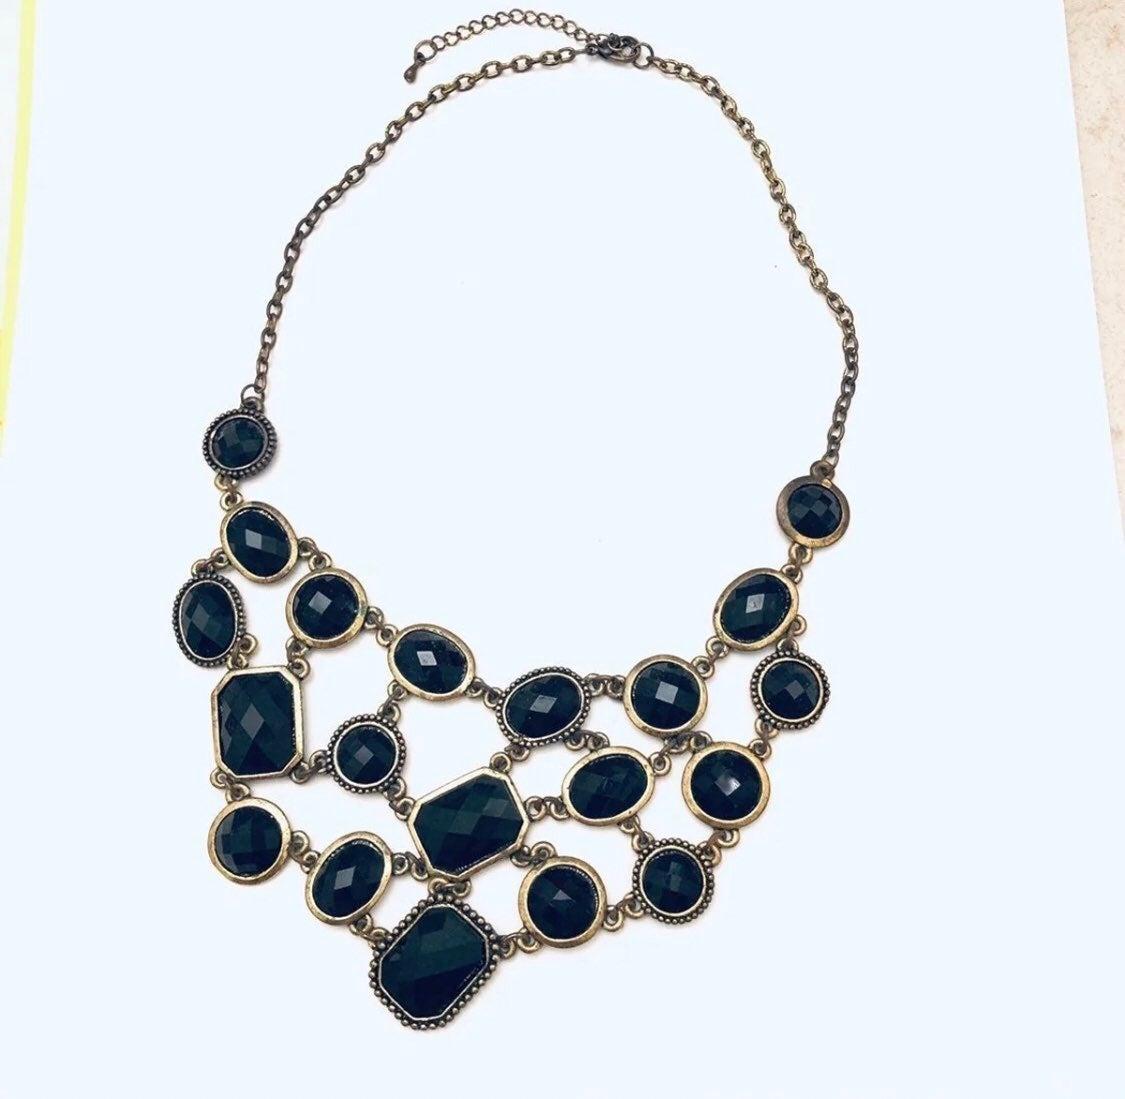 Black statement Necklace - new